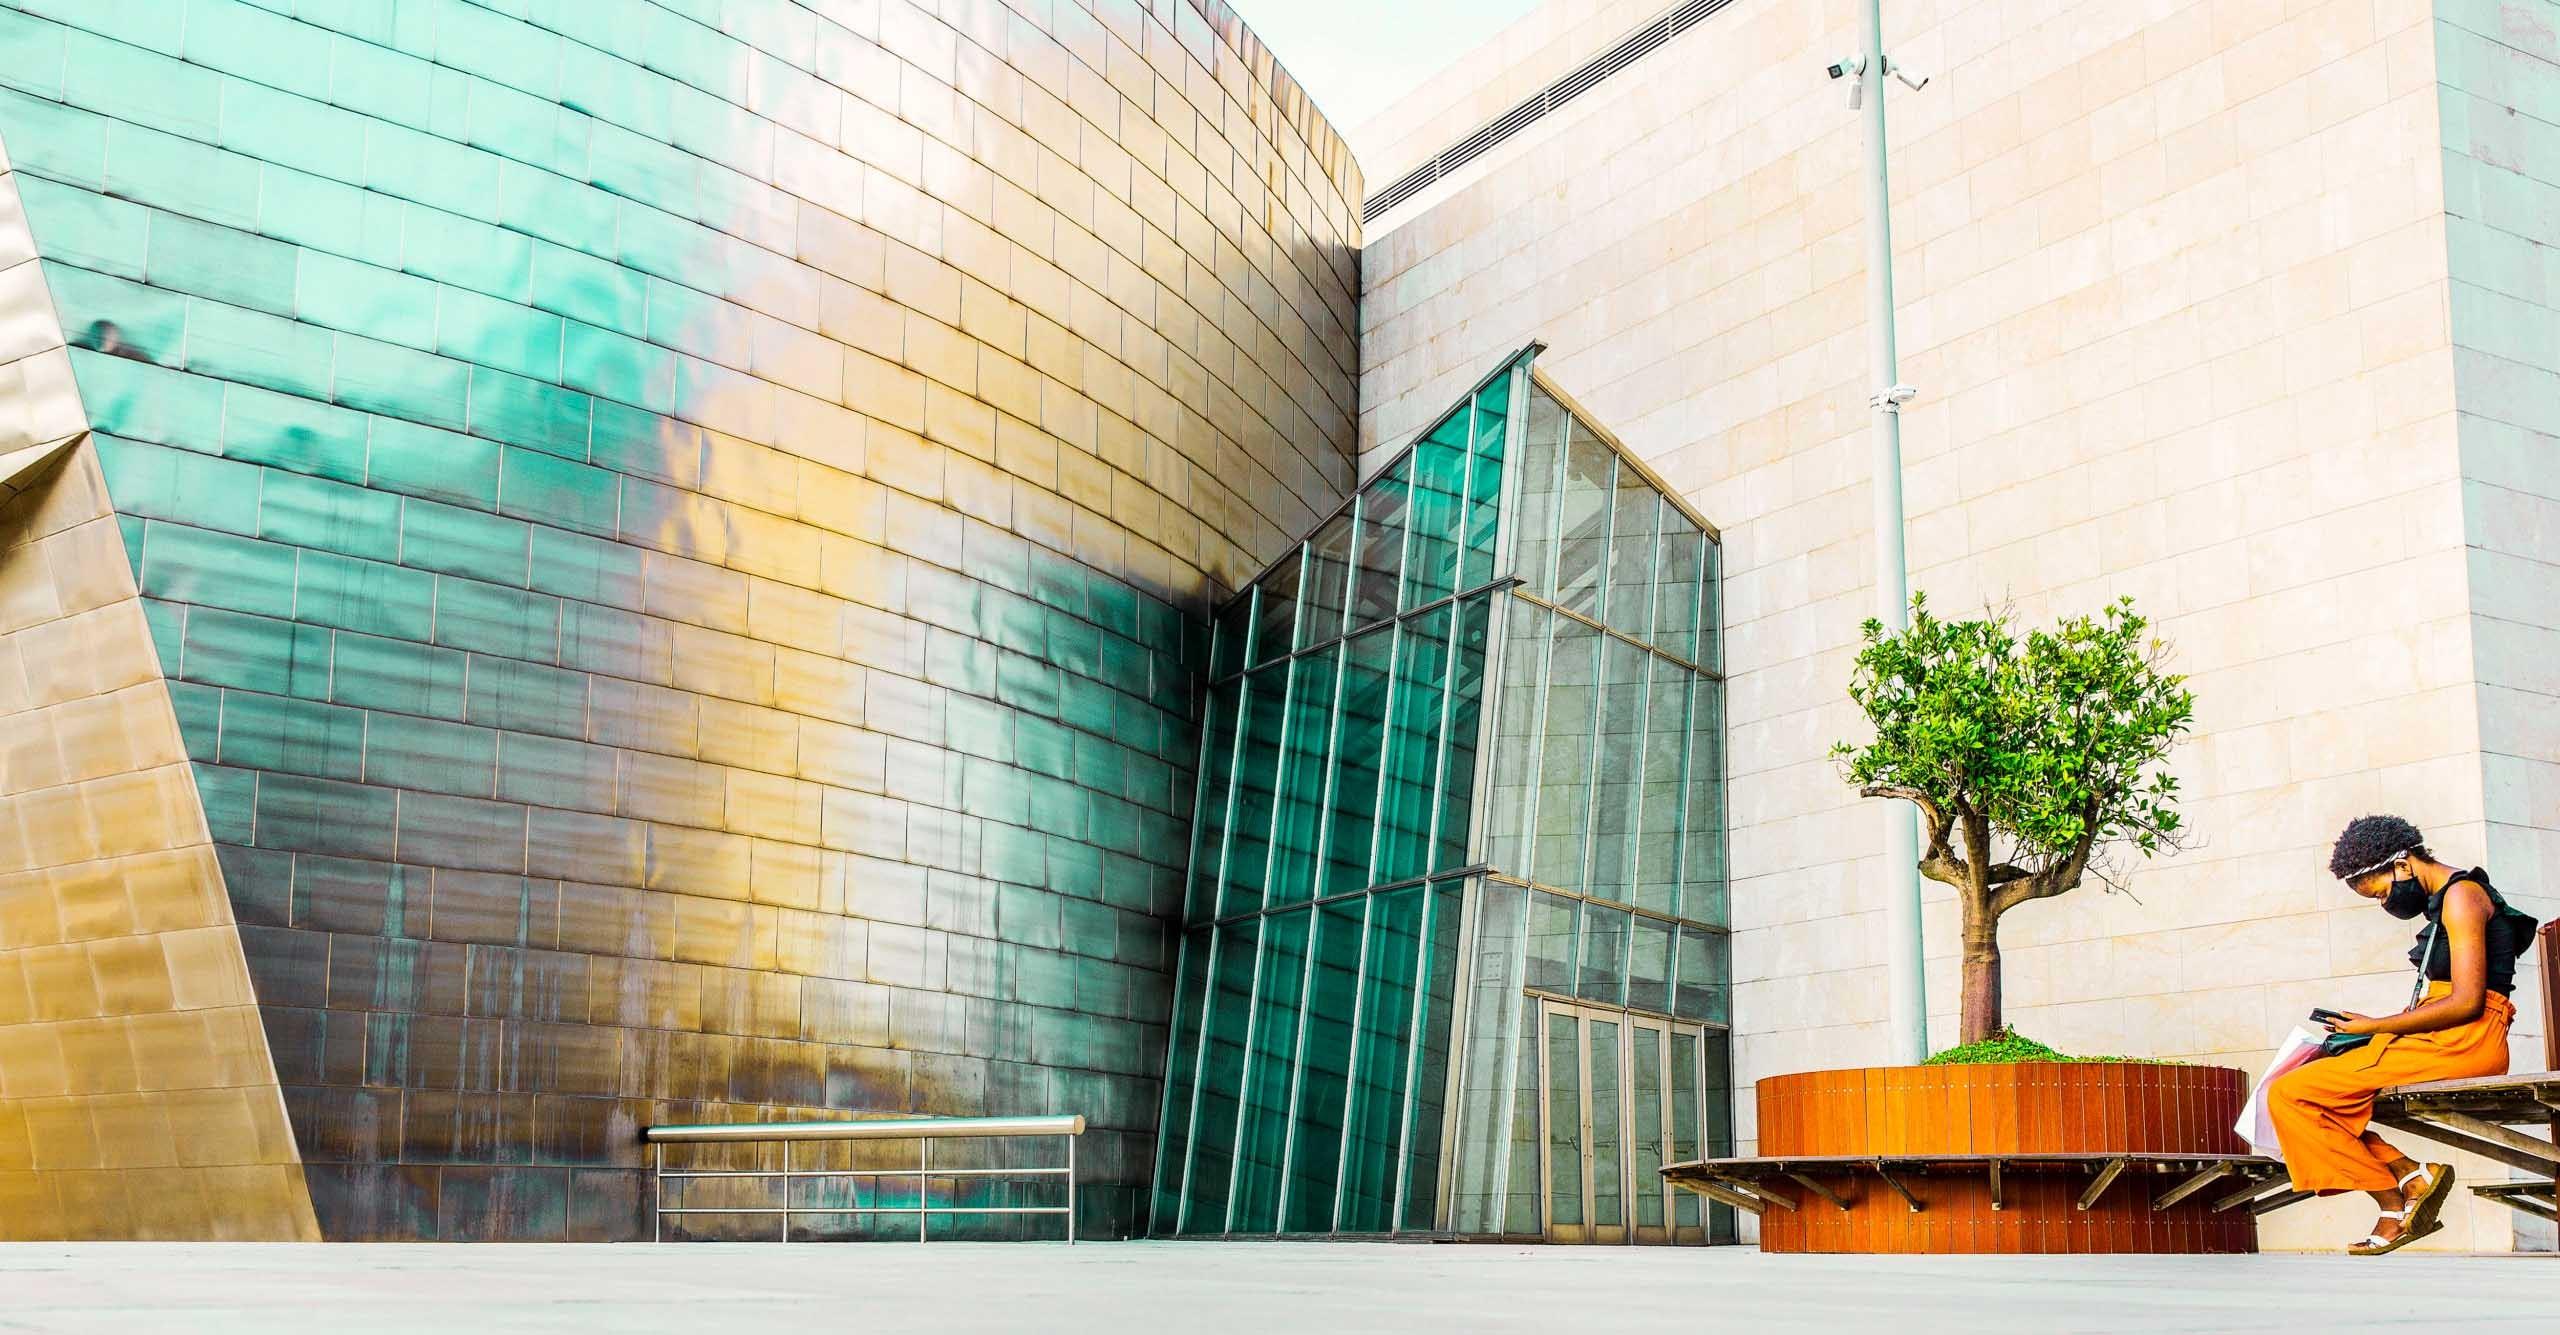 Frau vor dem Guggenheim-Museum in Bilbao